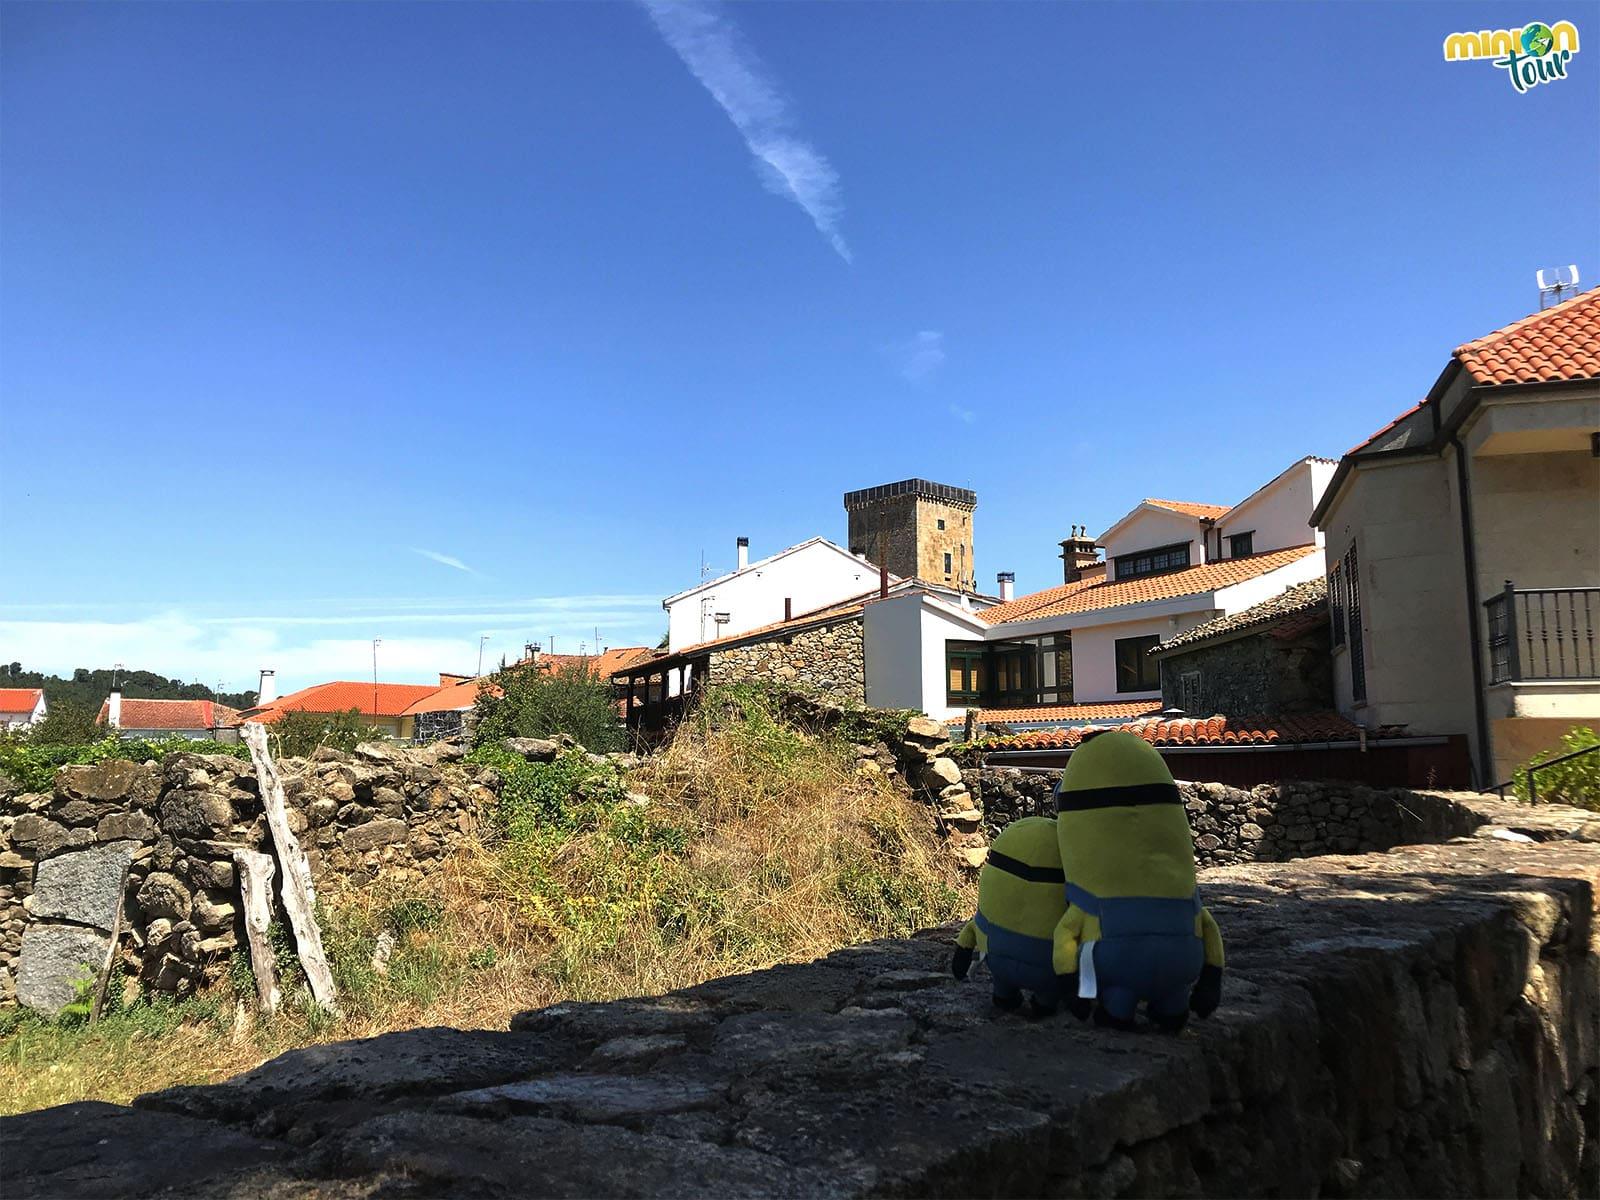 Minions recorriendo Vilanova dos Infantes